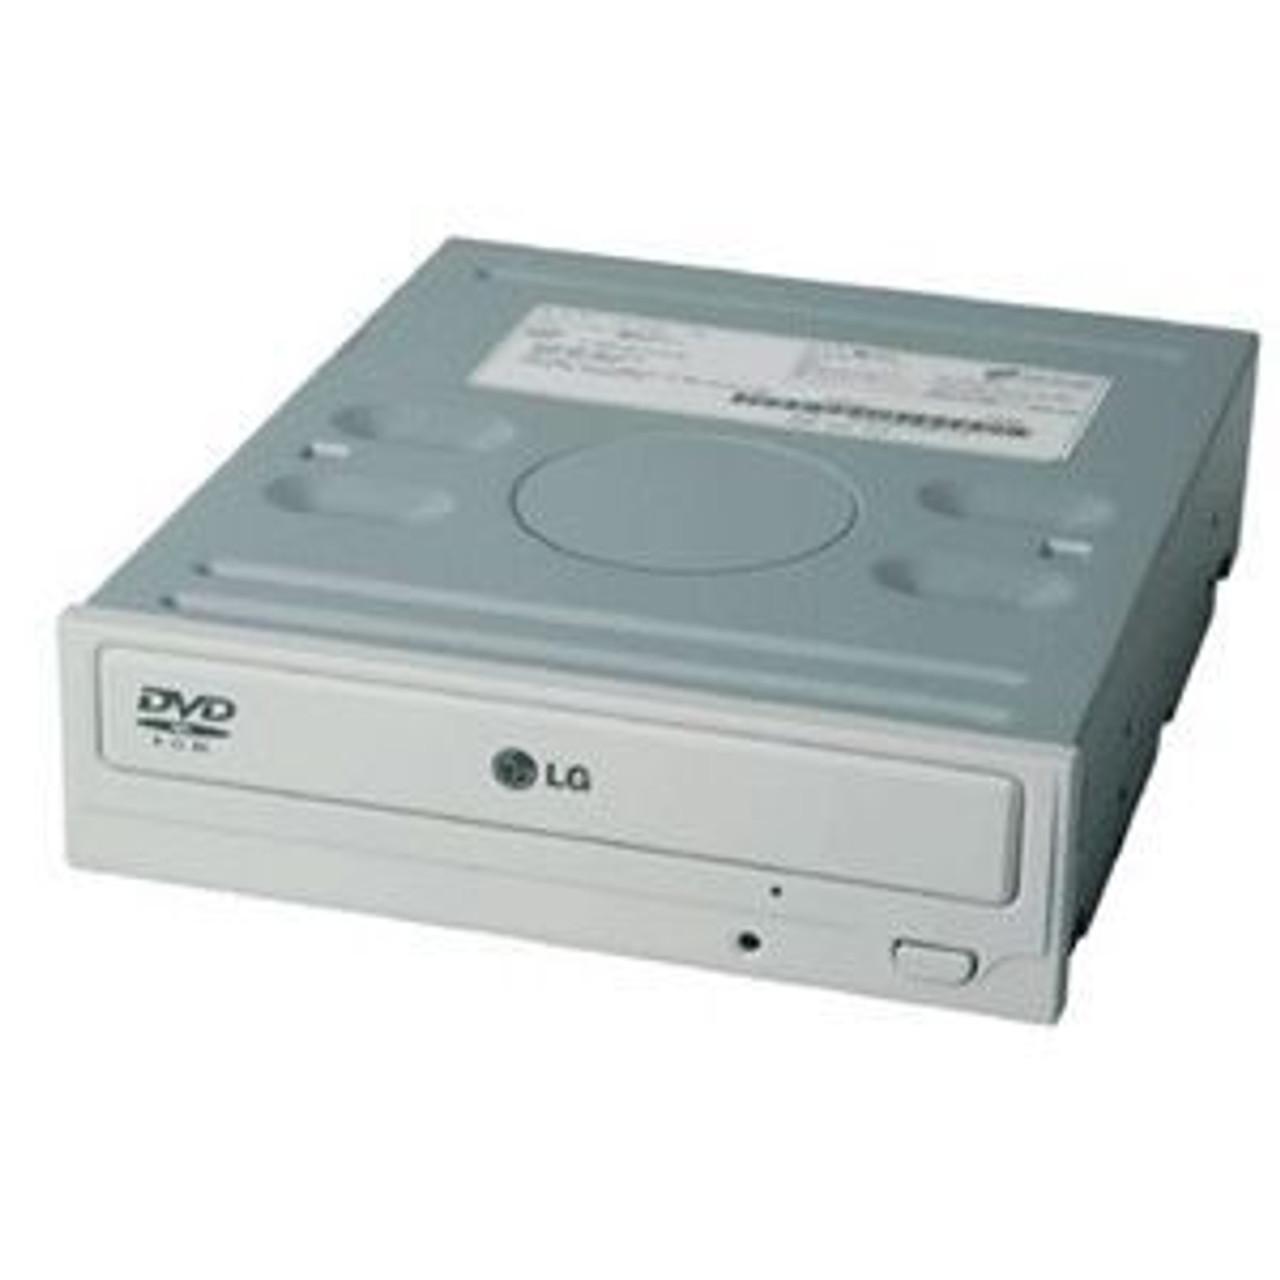 GDR-8164B - HP 16x DVD-ROM Drive - (Double-layer) - DVD-ROM - EIDE/ATAPI - Internal